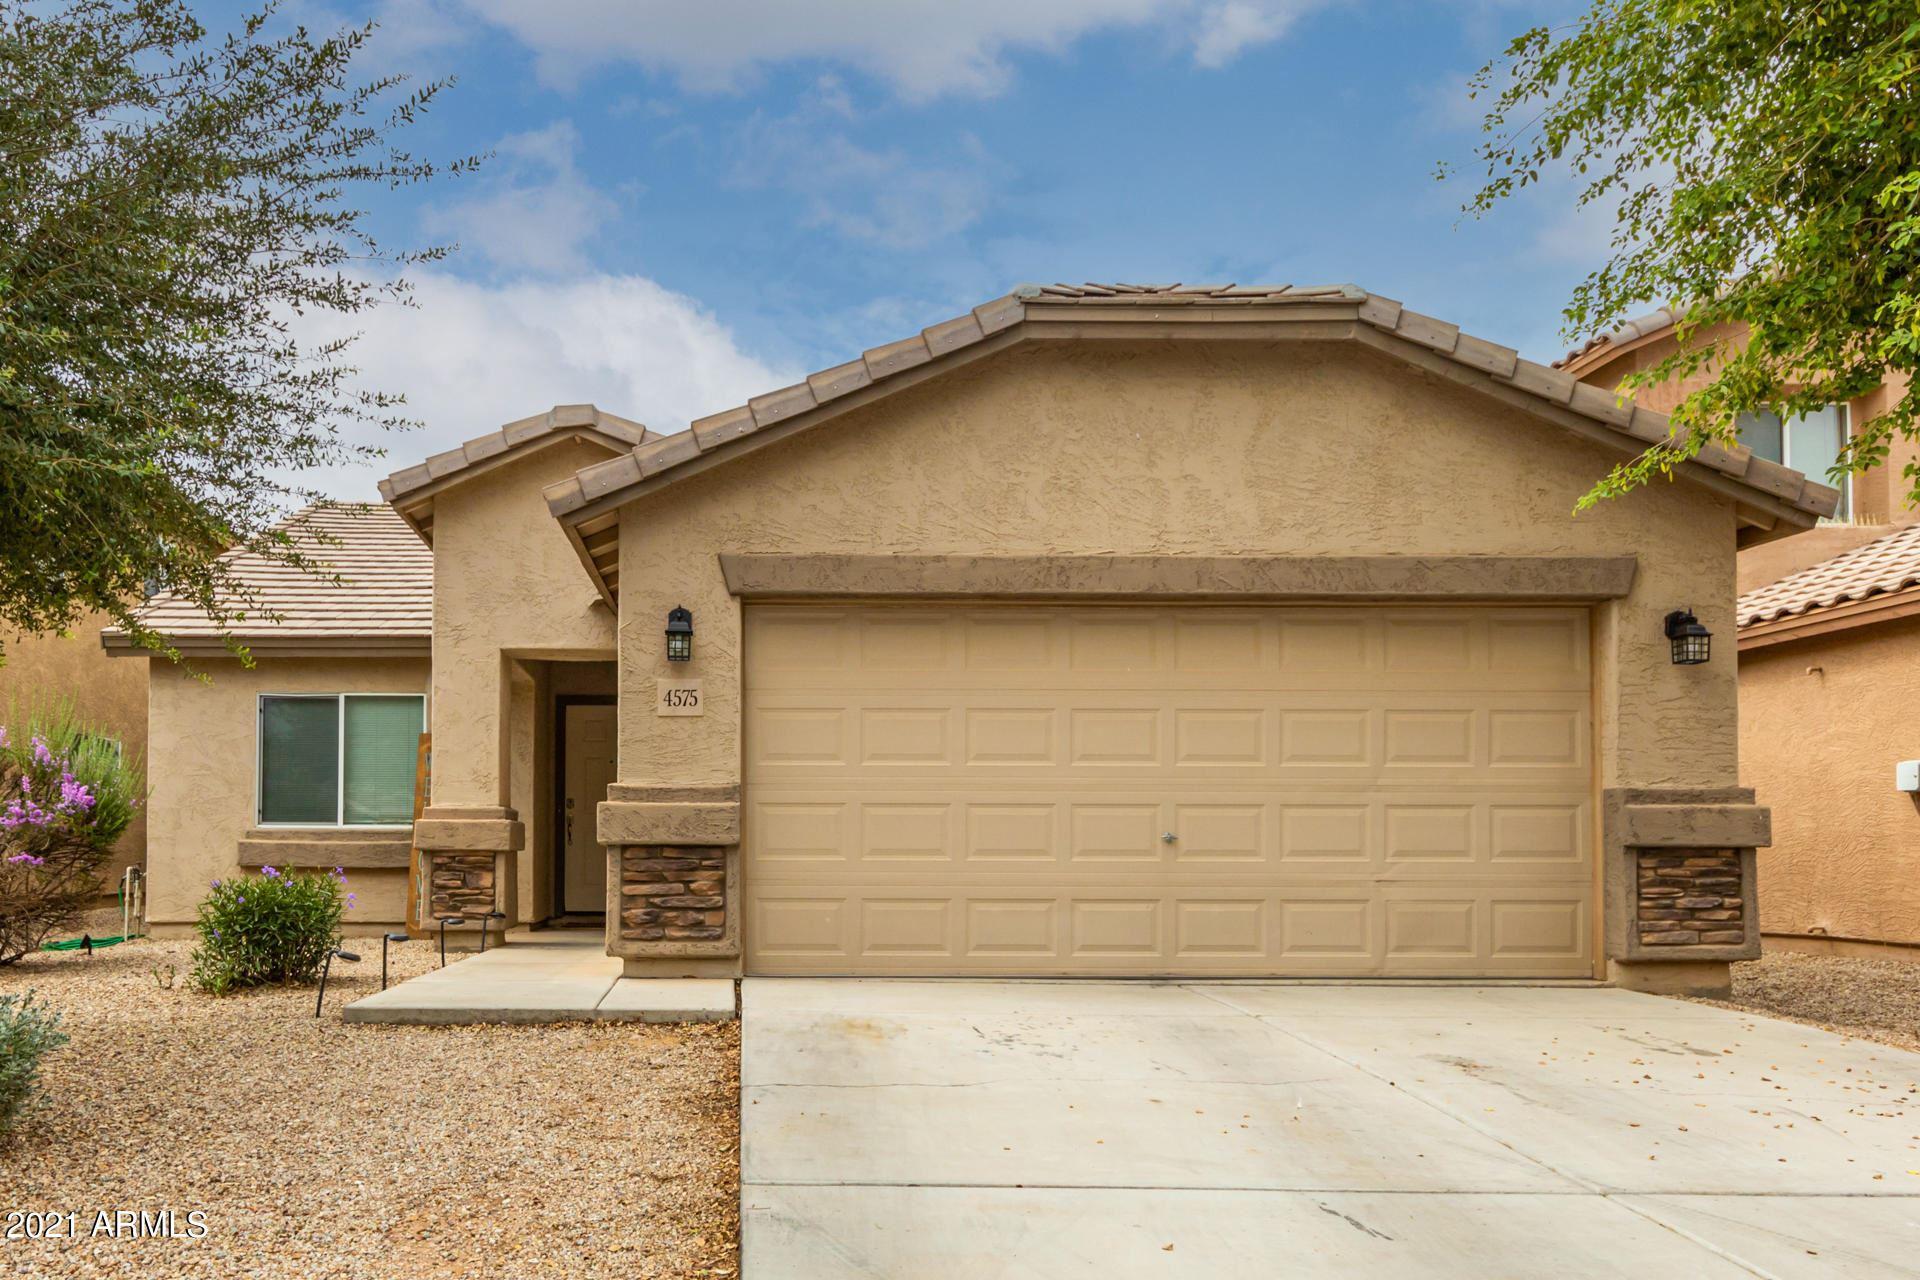 Photo of 4575 E SUPERIOR Road, San Tan Valley, AZ 85143 (MLS # 6268915)